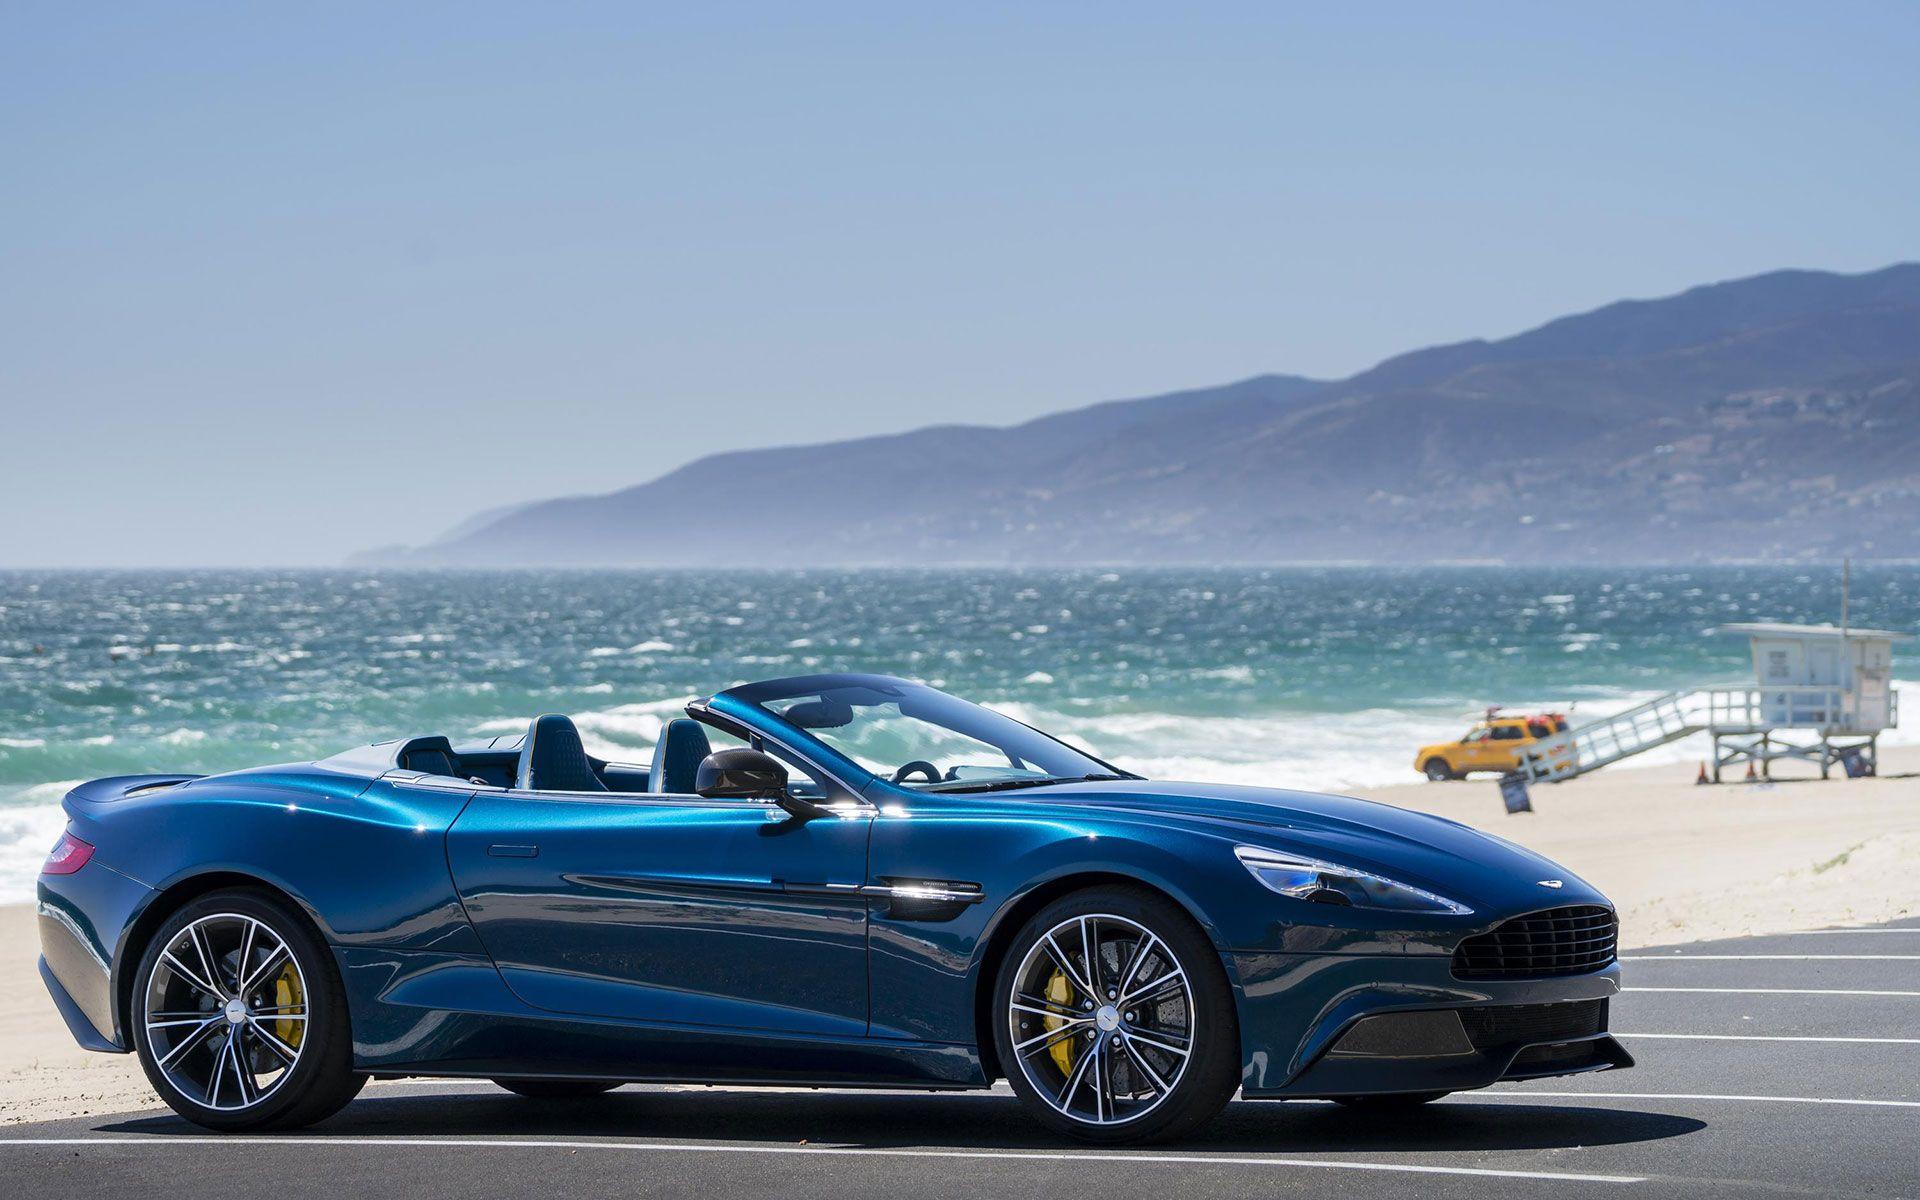 2015 Aston Martin Vanquish Hd Car Wallpaper